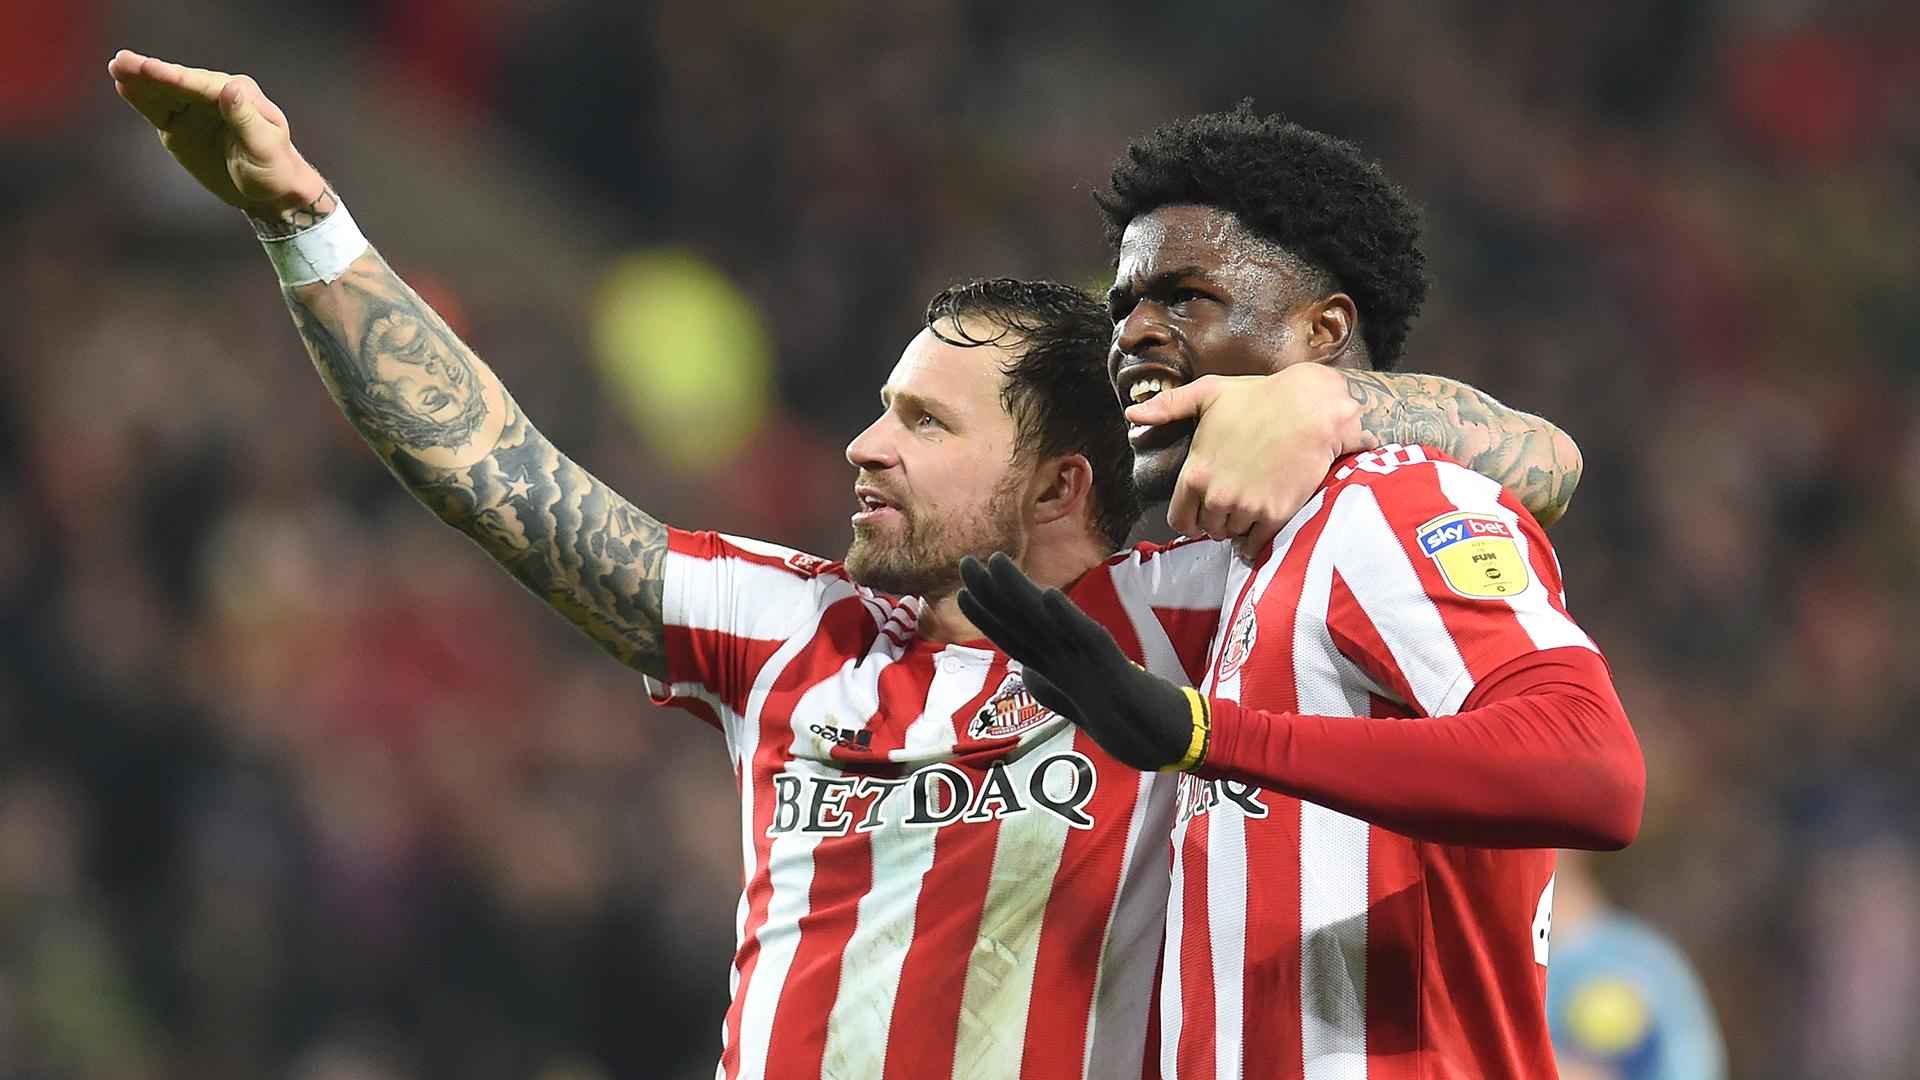 Charlton Athletic Vs Sunderland Tv Channel Live Stream Squad News Preview Goal Com